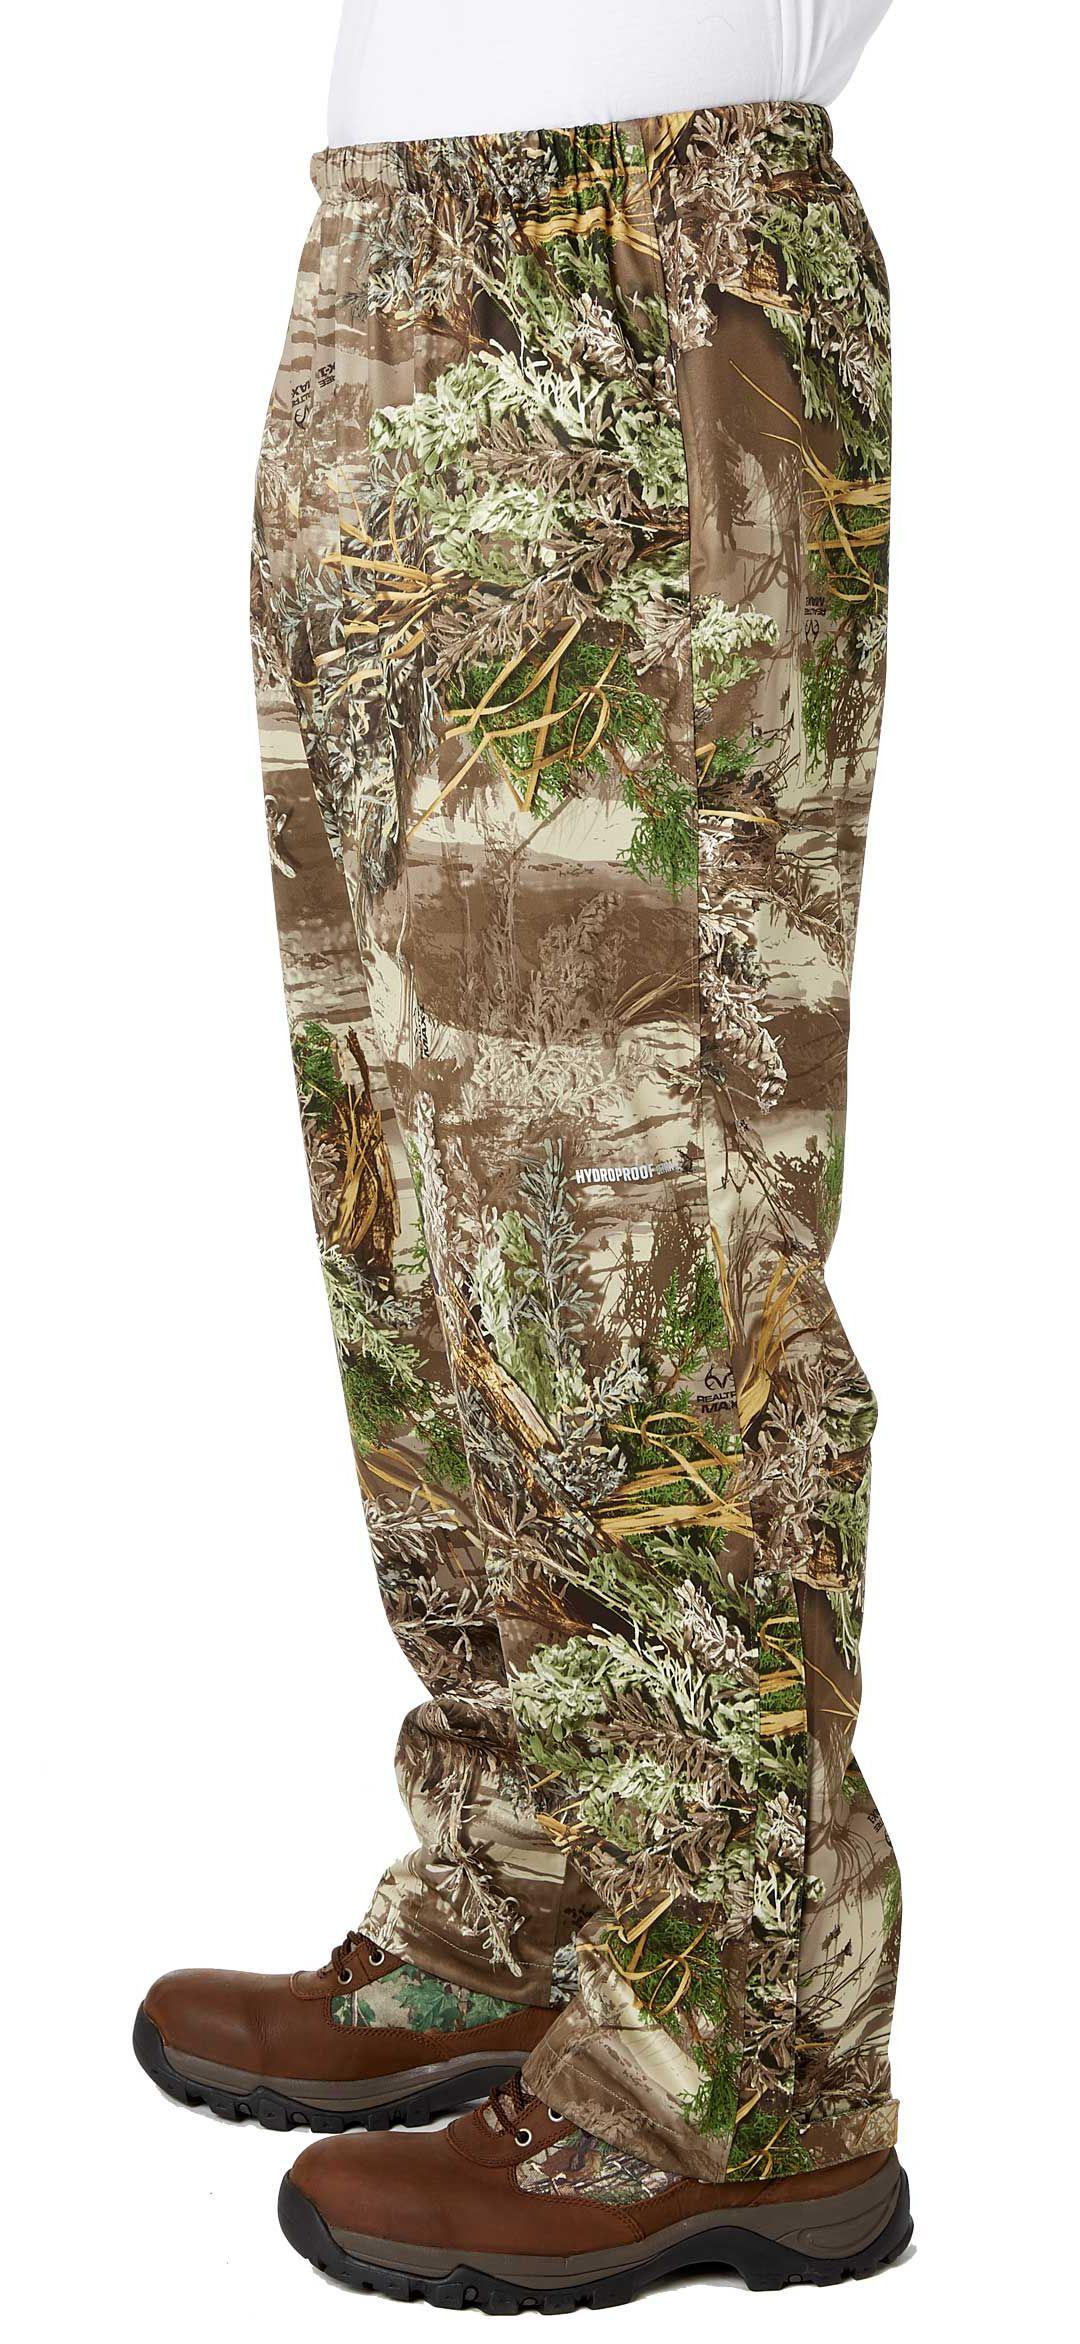 654a5fa48ffb0 Field & Stream Lightweight Packable Rain Hunting Pants | Field & Stream